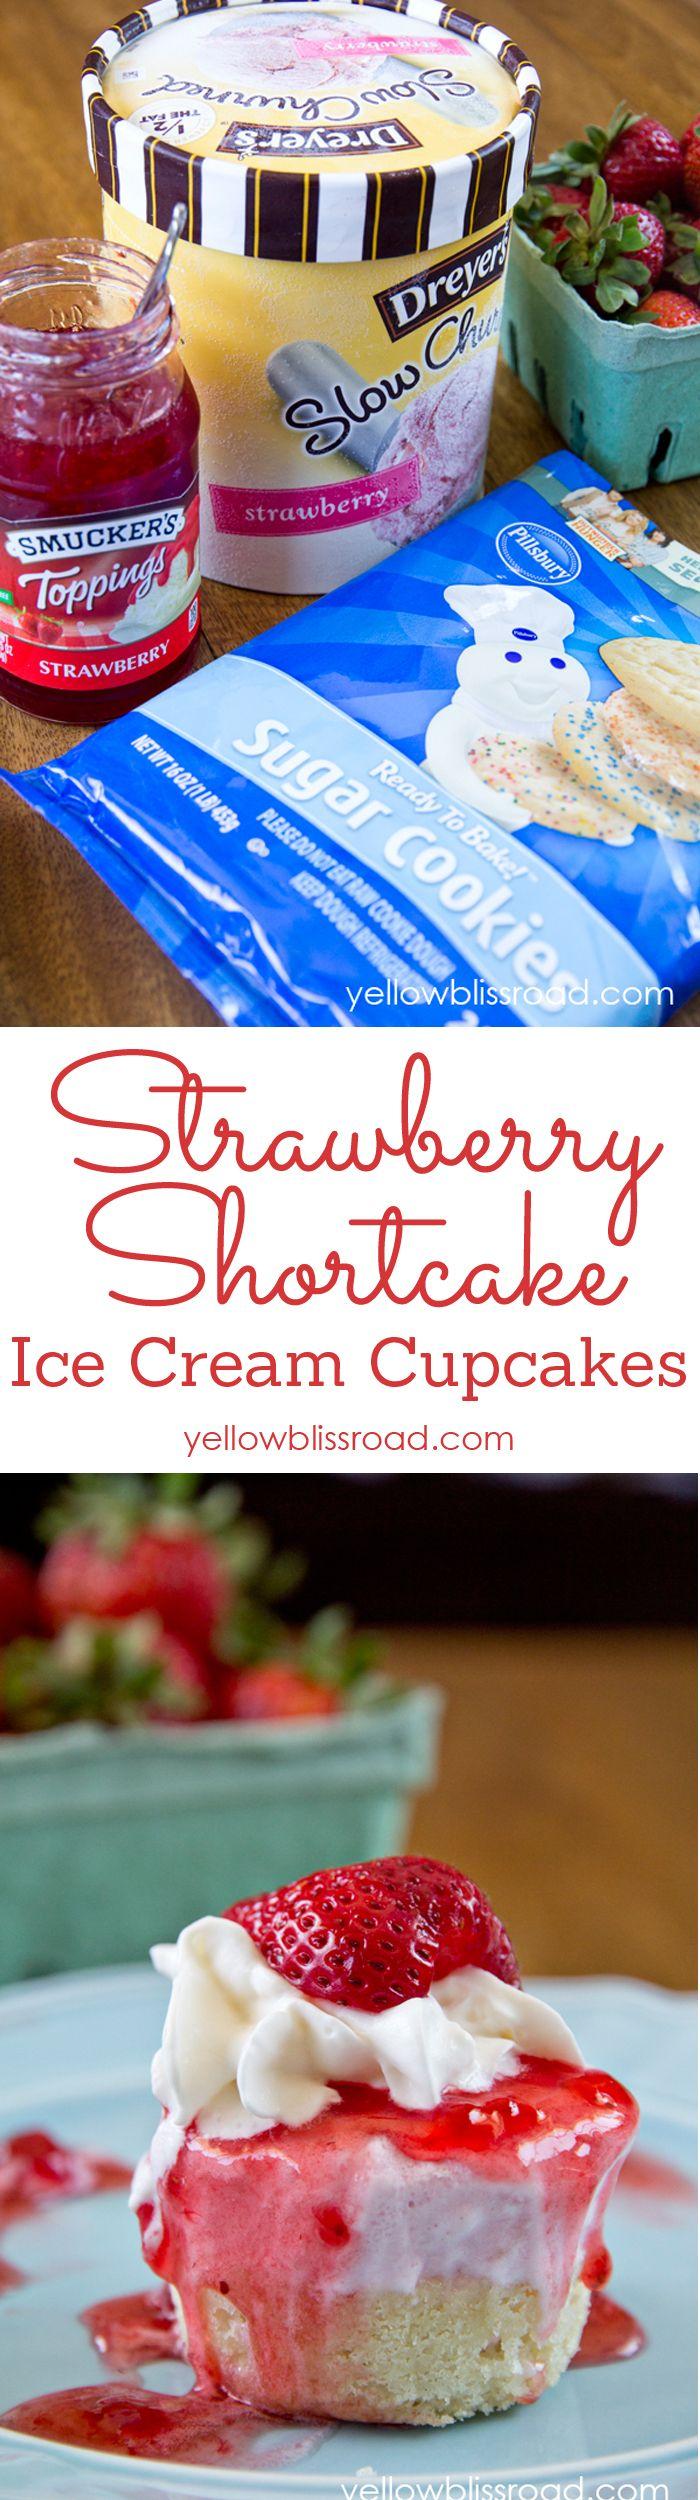 Strawberry Shortcake Ice Cream Cupcakes